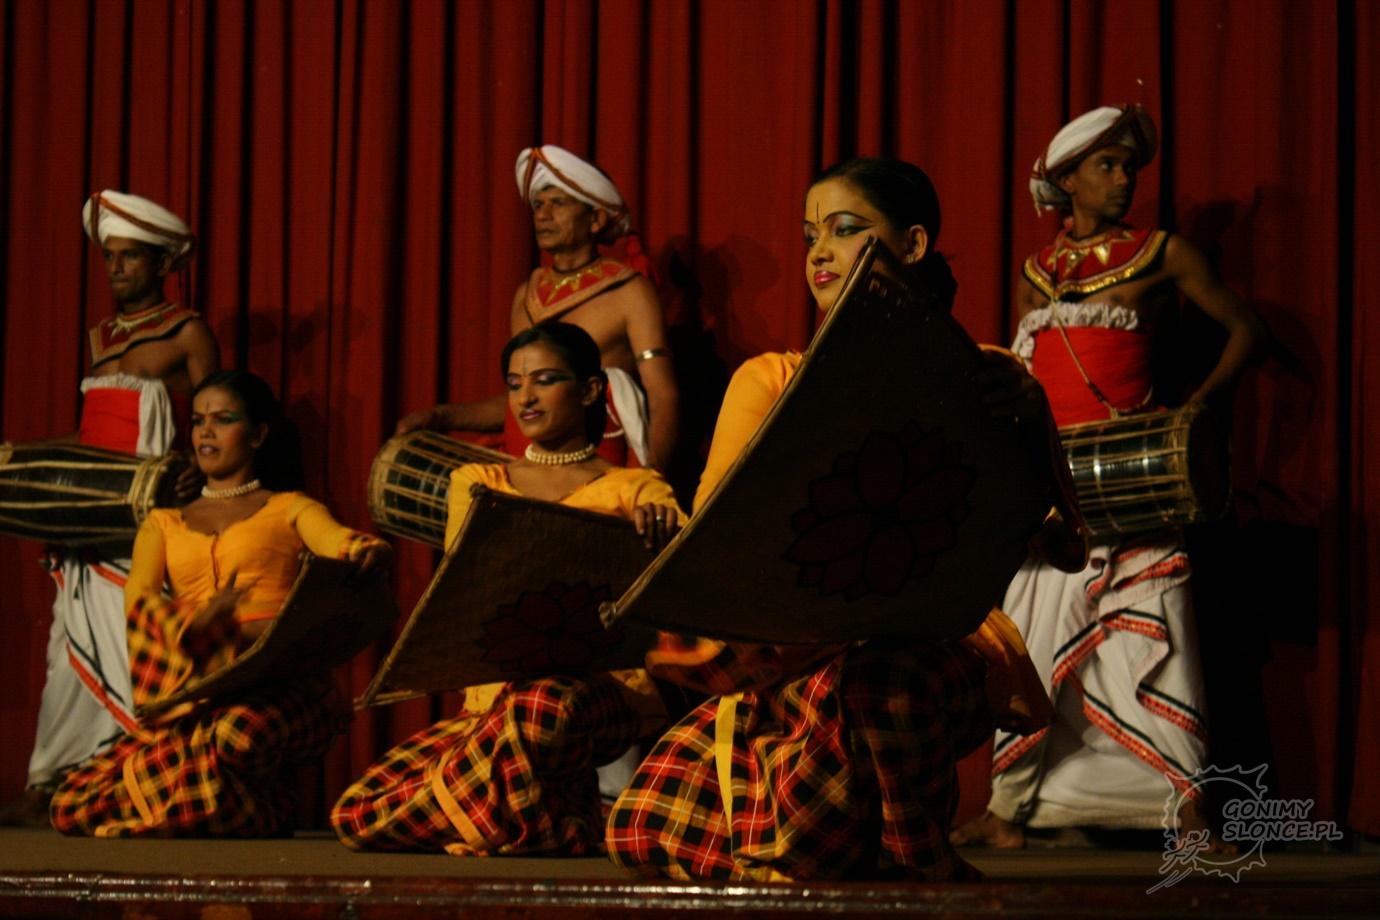 Lankijskie tancerki - Cejlon kulturalnie